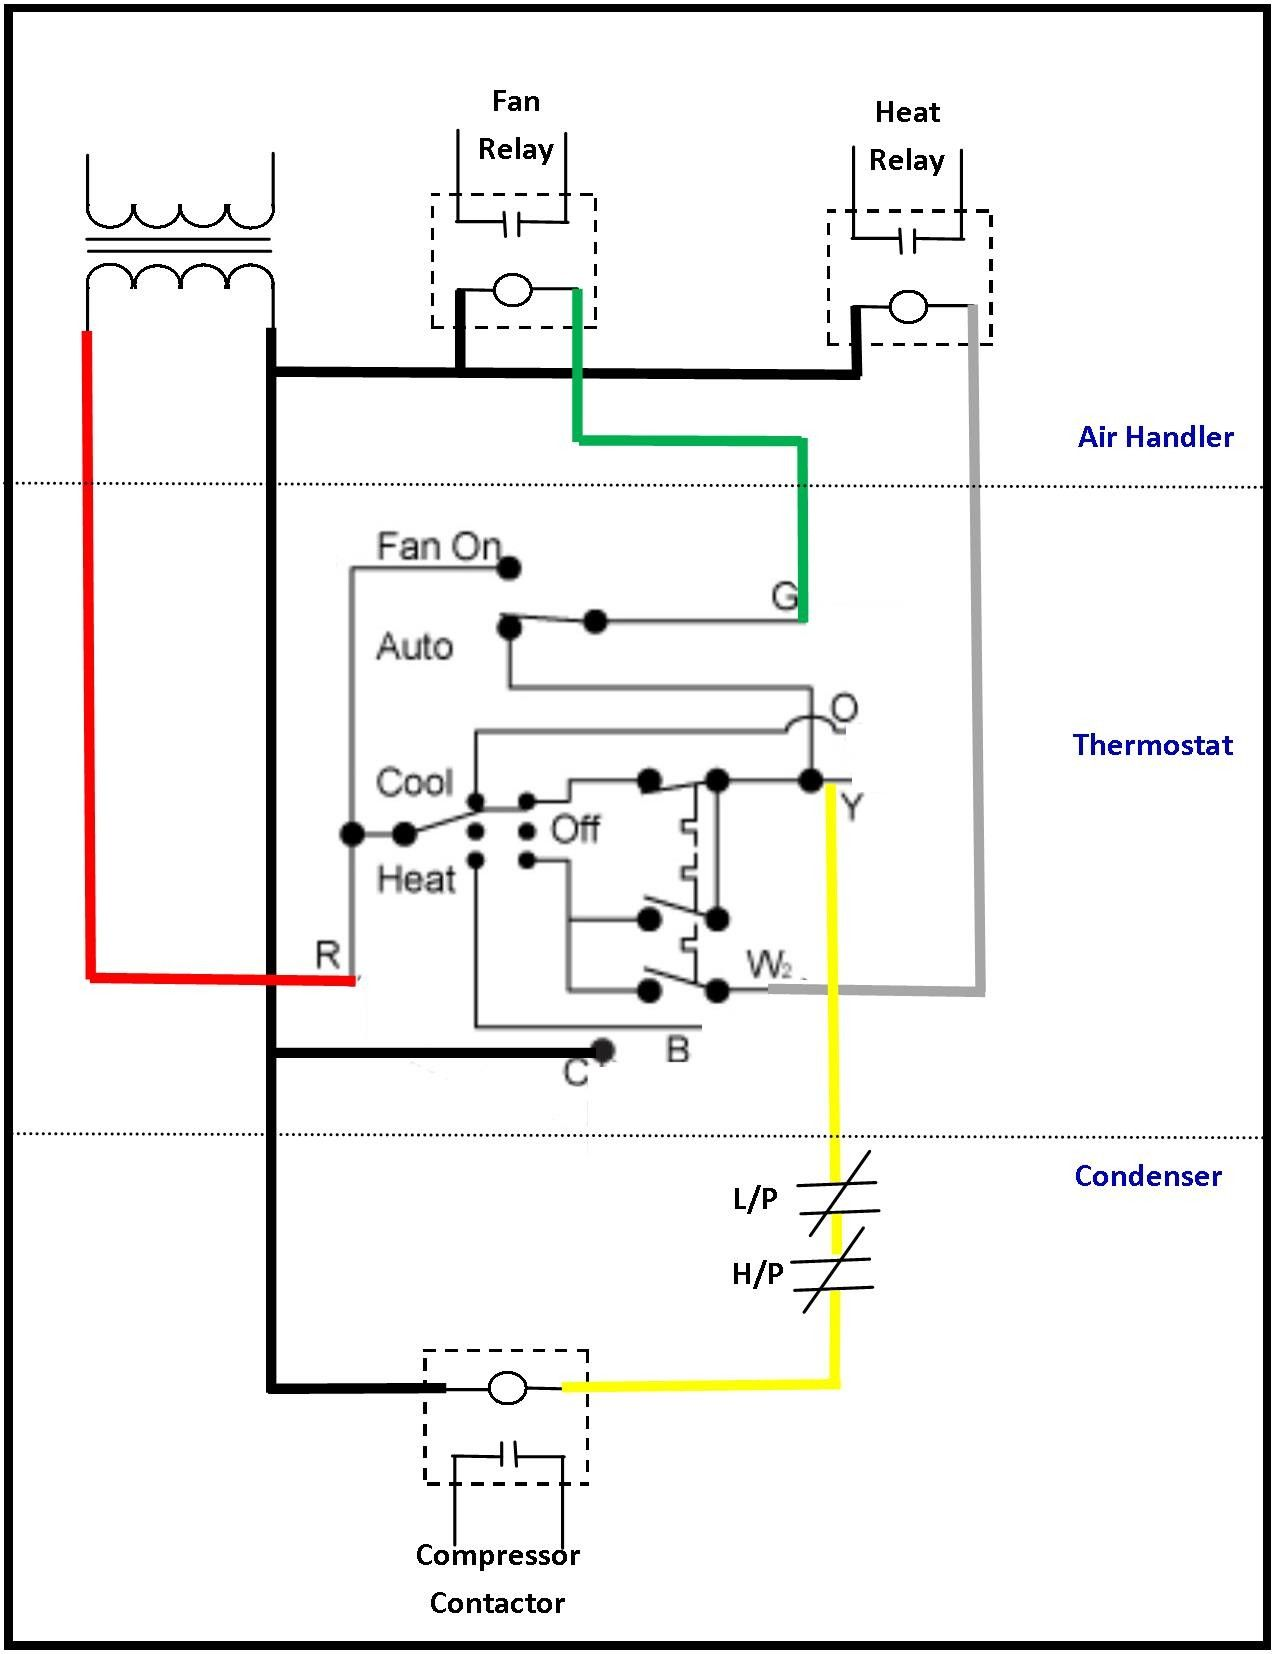 medium resolution of new industrial exhaust fan wiring diagram diagram diagramsamplenew industrial exhaust fan wiring diagram diagram diagramsample diagramtemplate